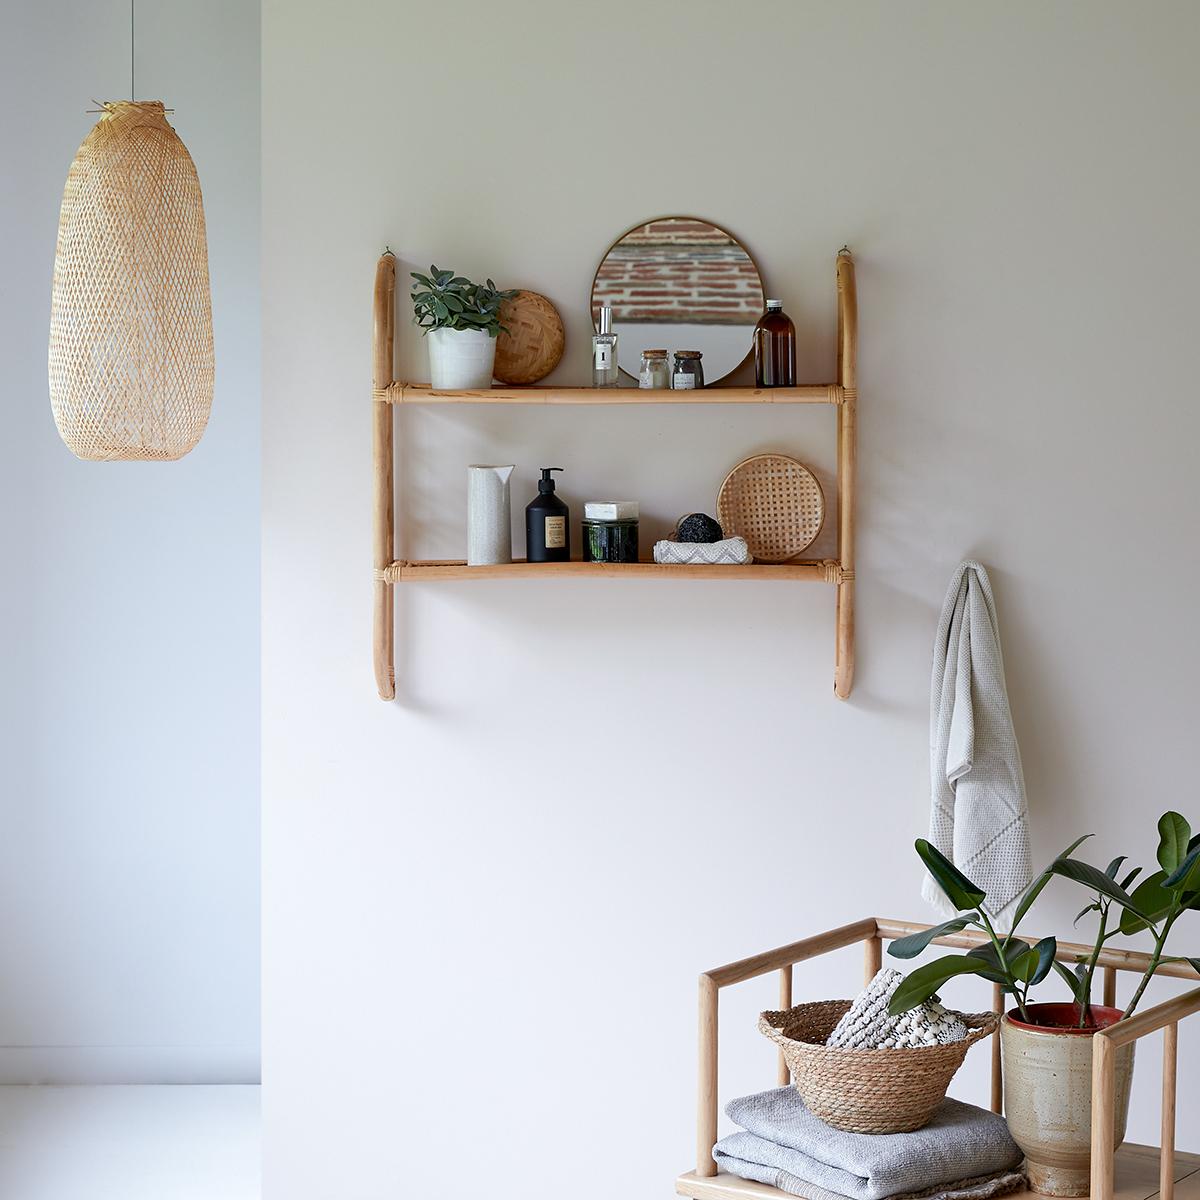 Marius rattan bathroom wall-mounted Shelf